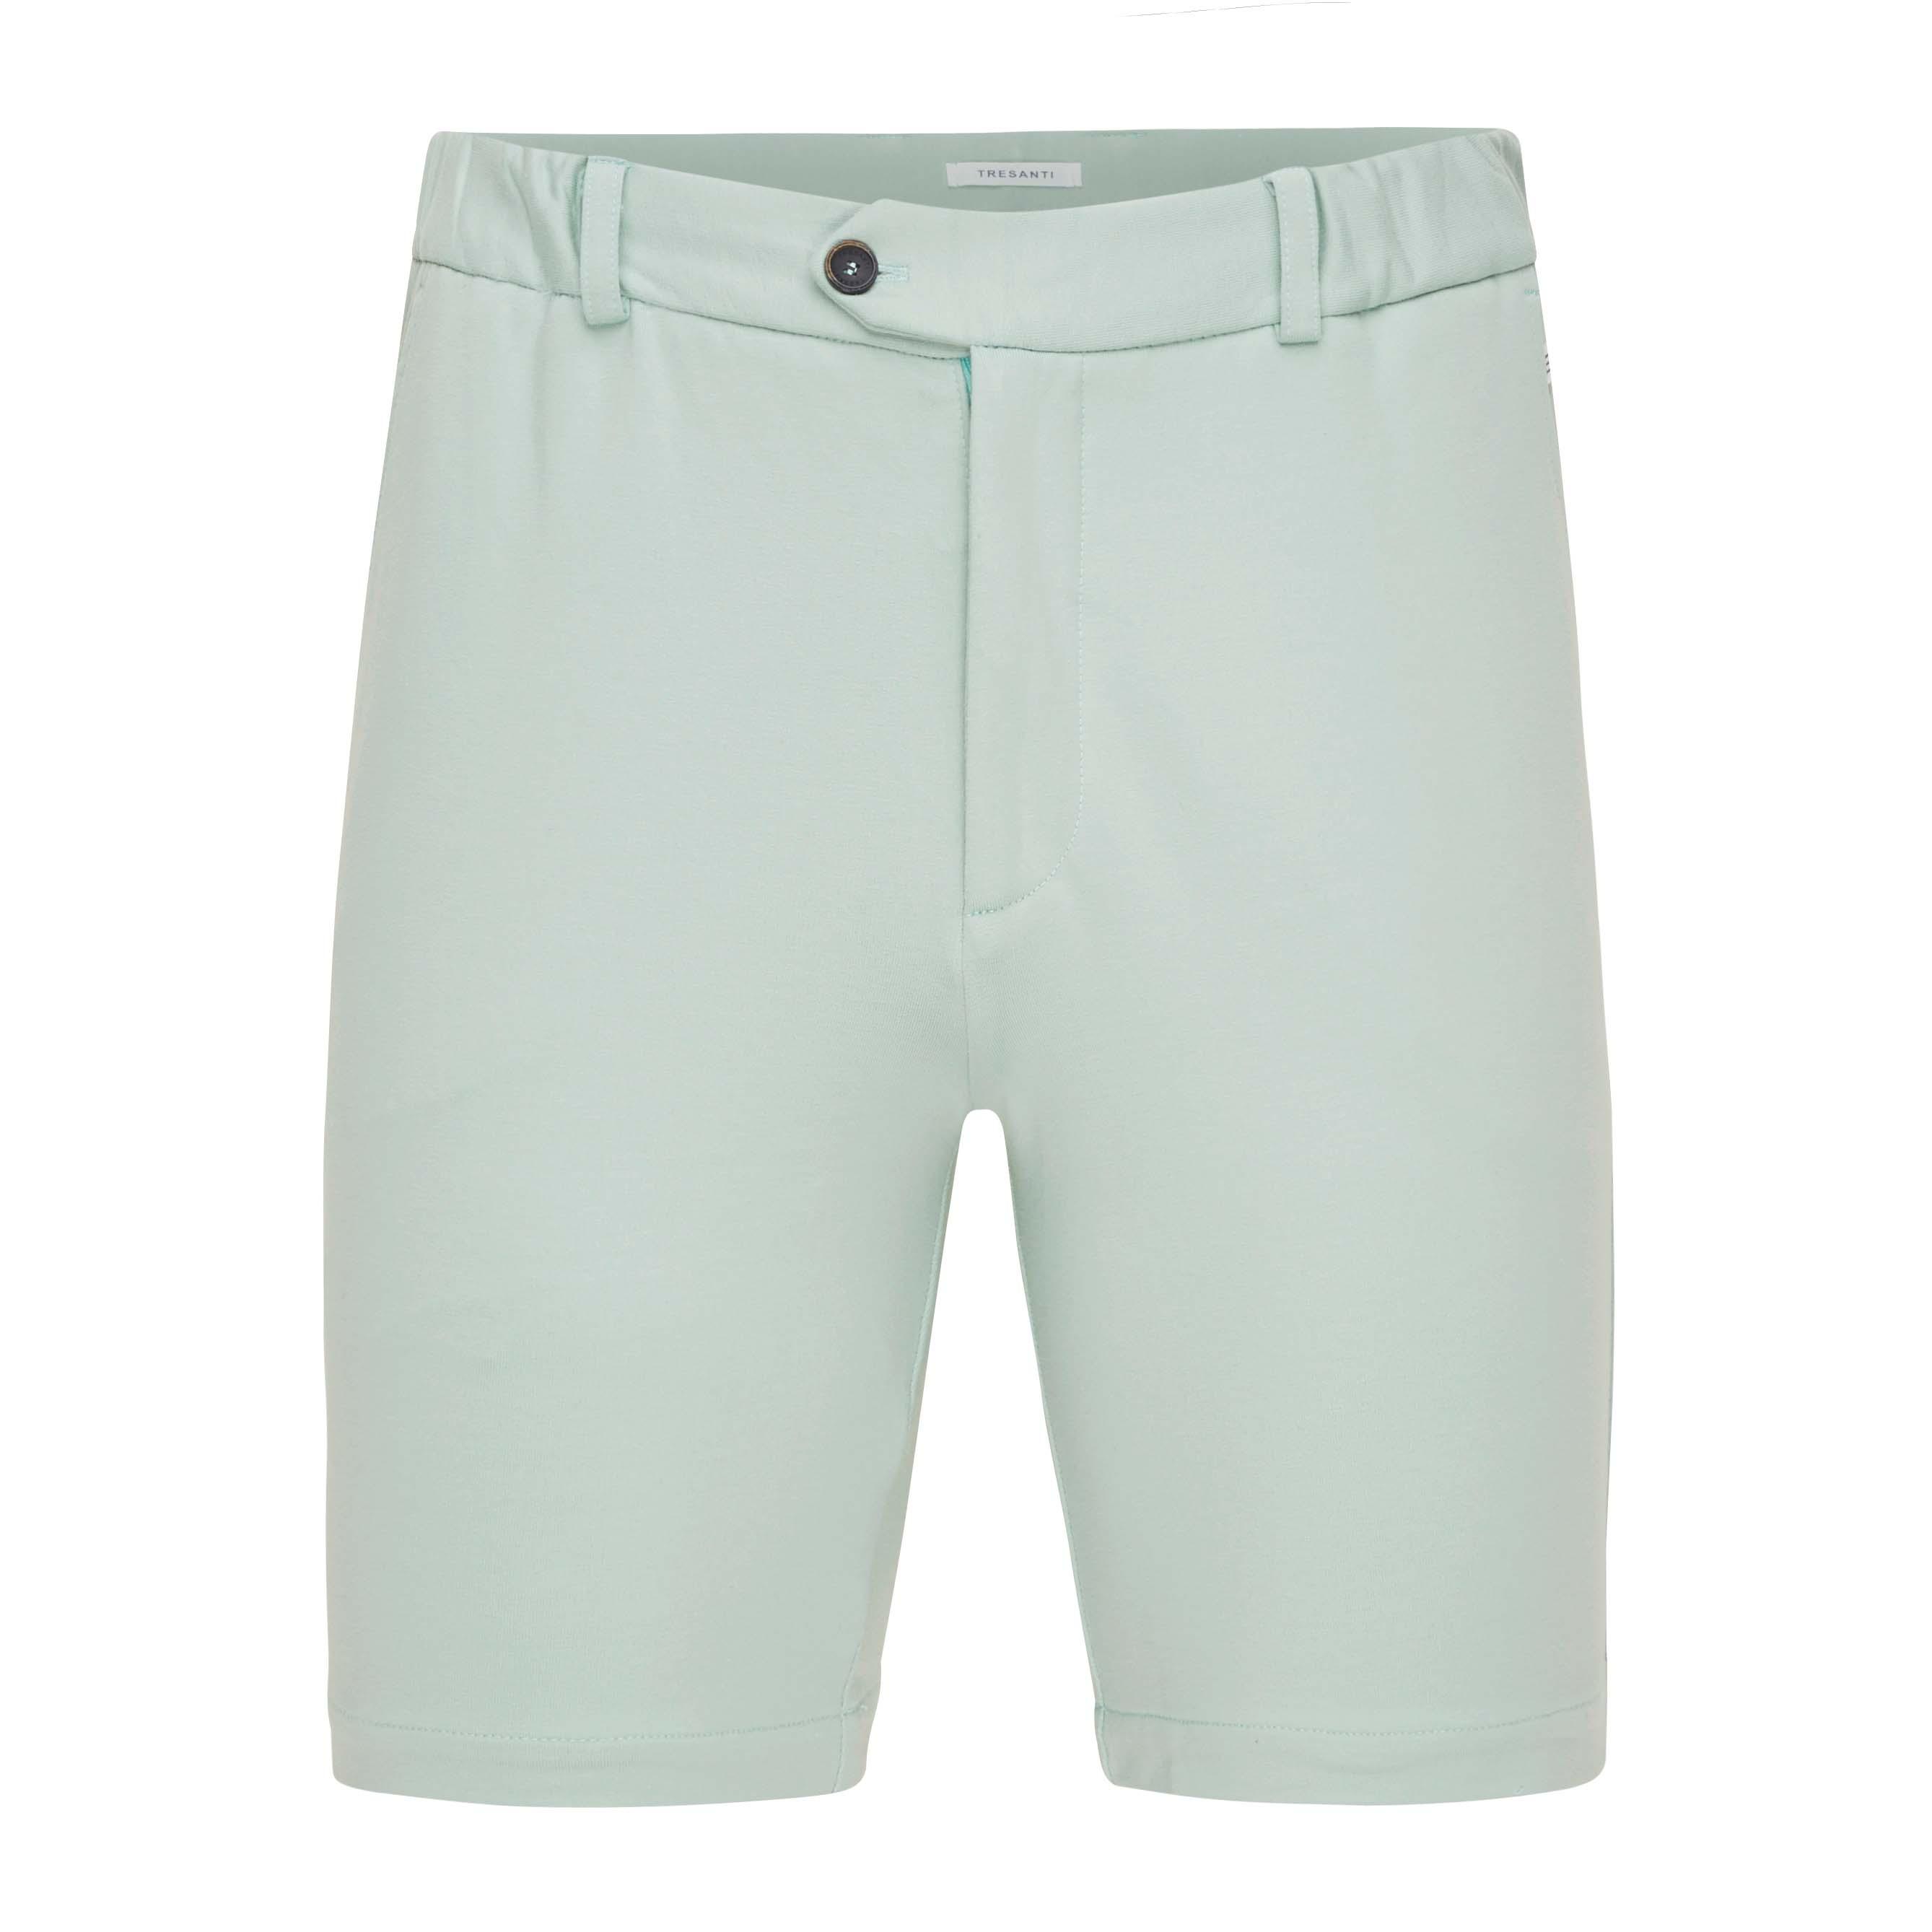 Trey   Shorts stretch mint green